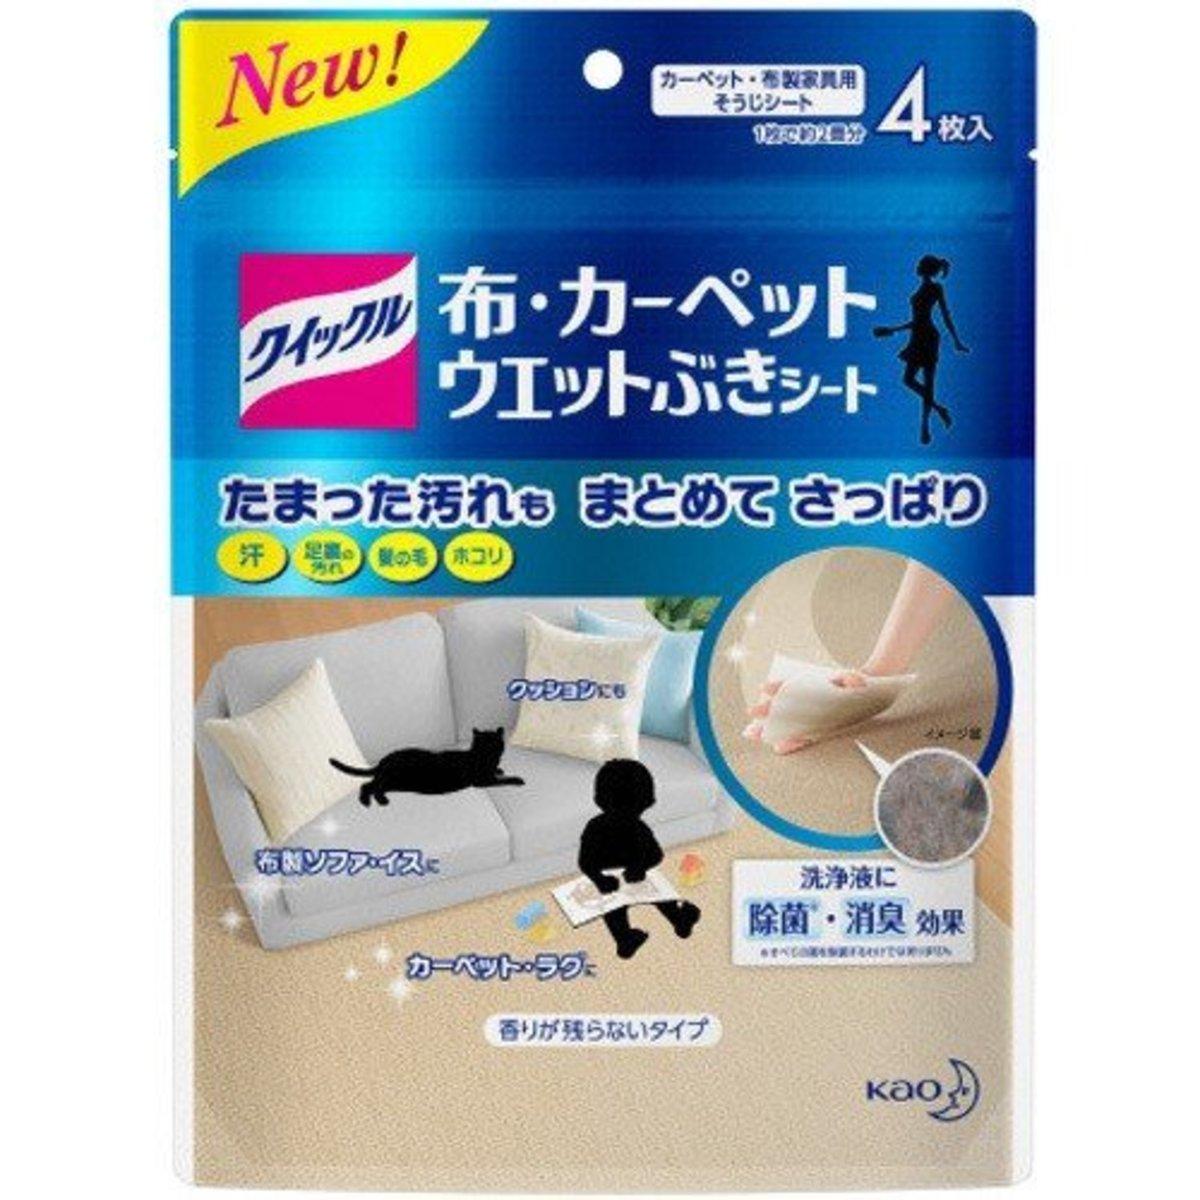 Made in Japan Carpet & Fabric Antibacterial & Deodorization Cleaning Cloth (4pcs/pack) x 1 Pack